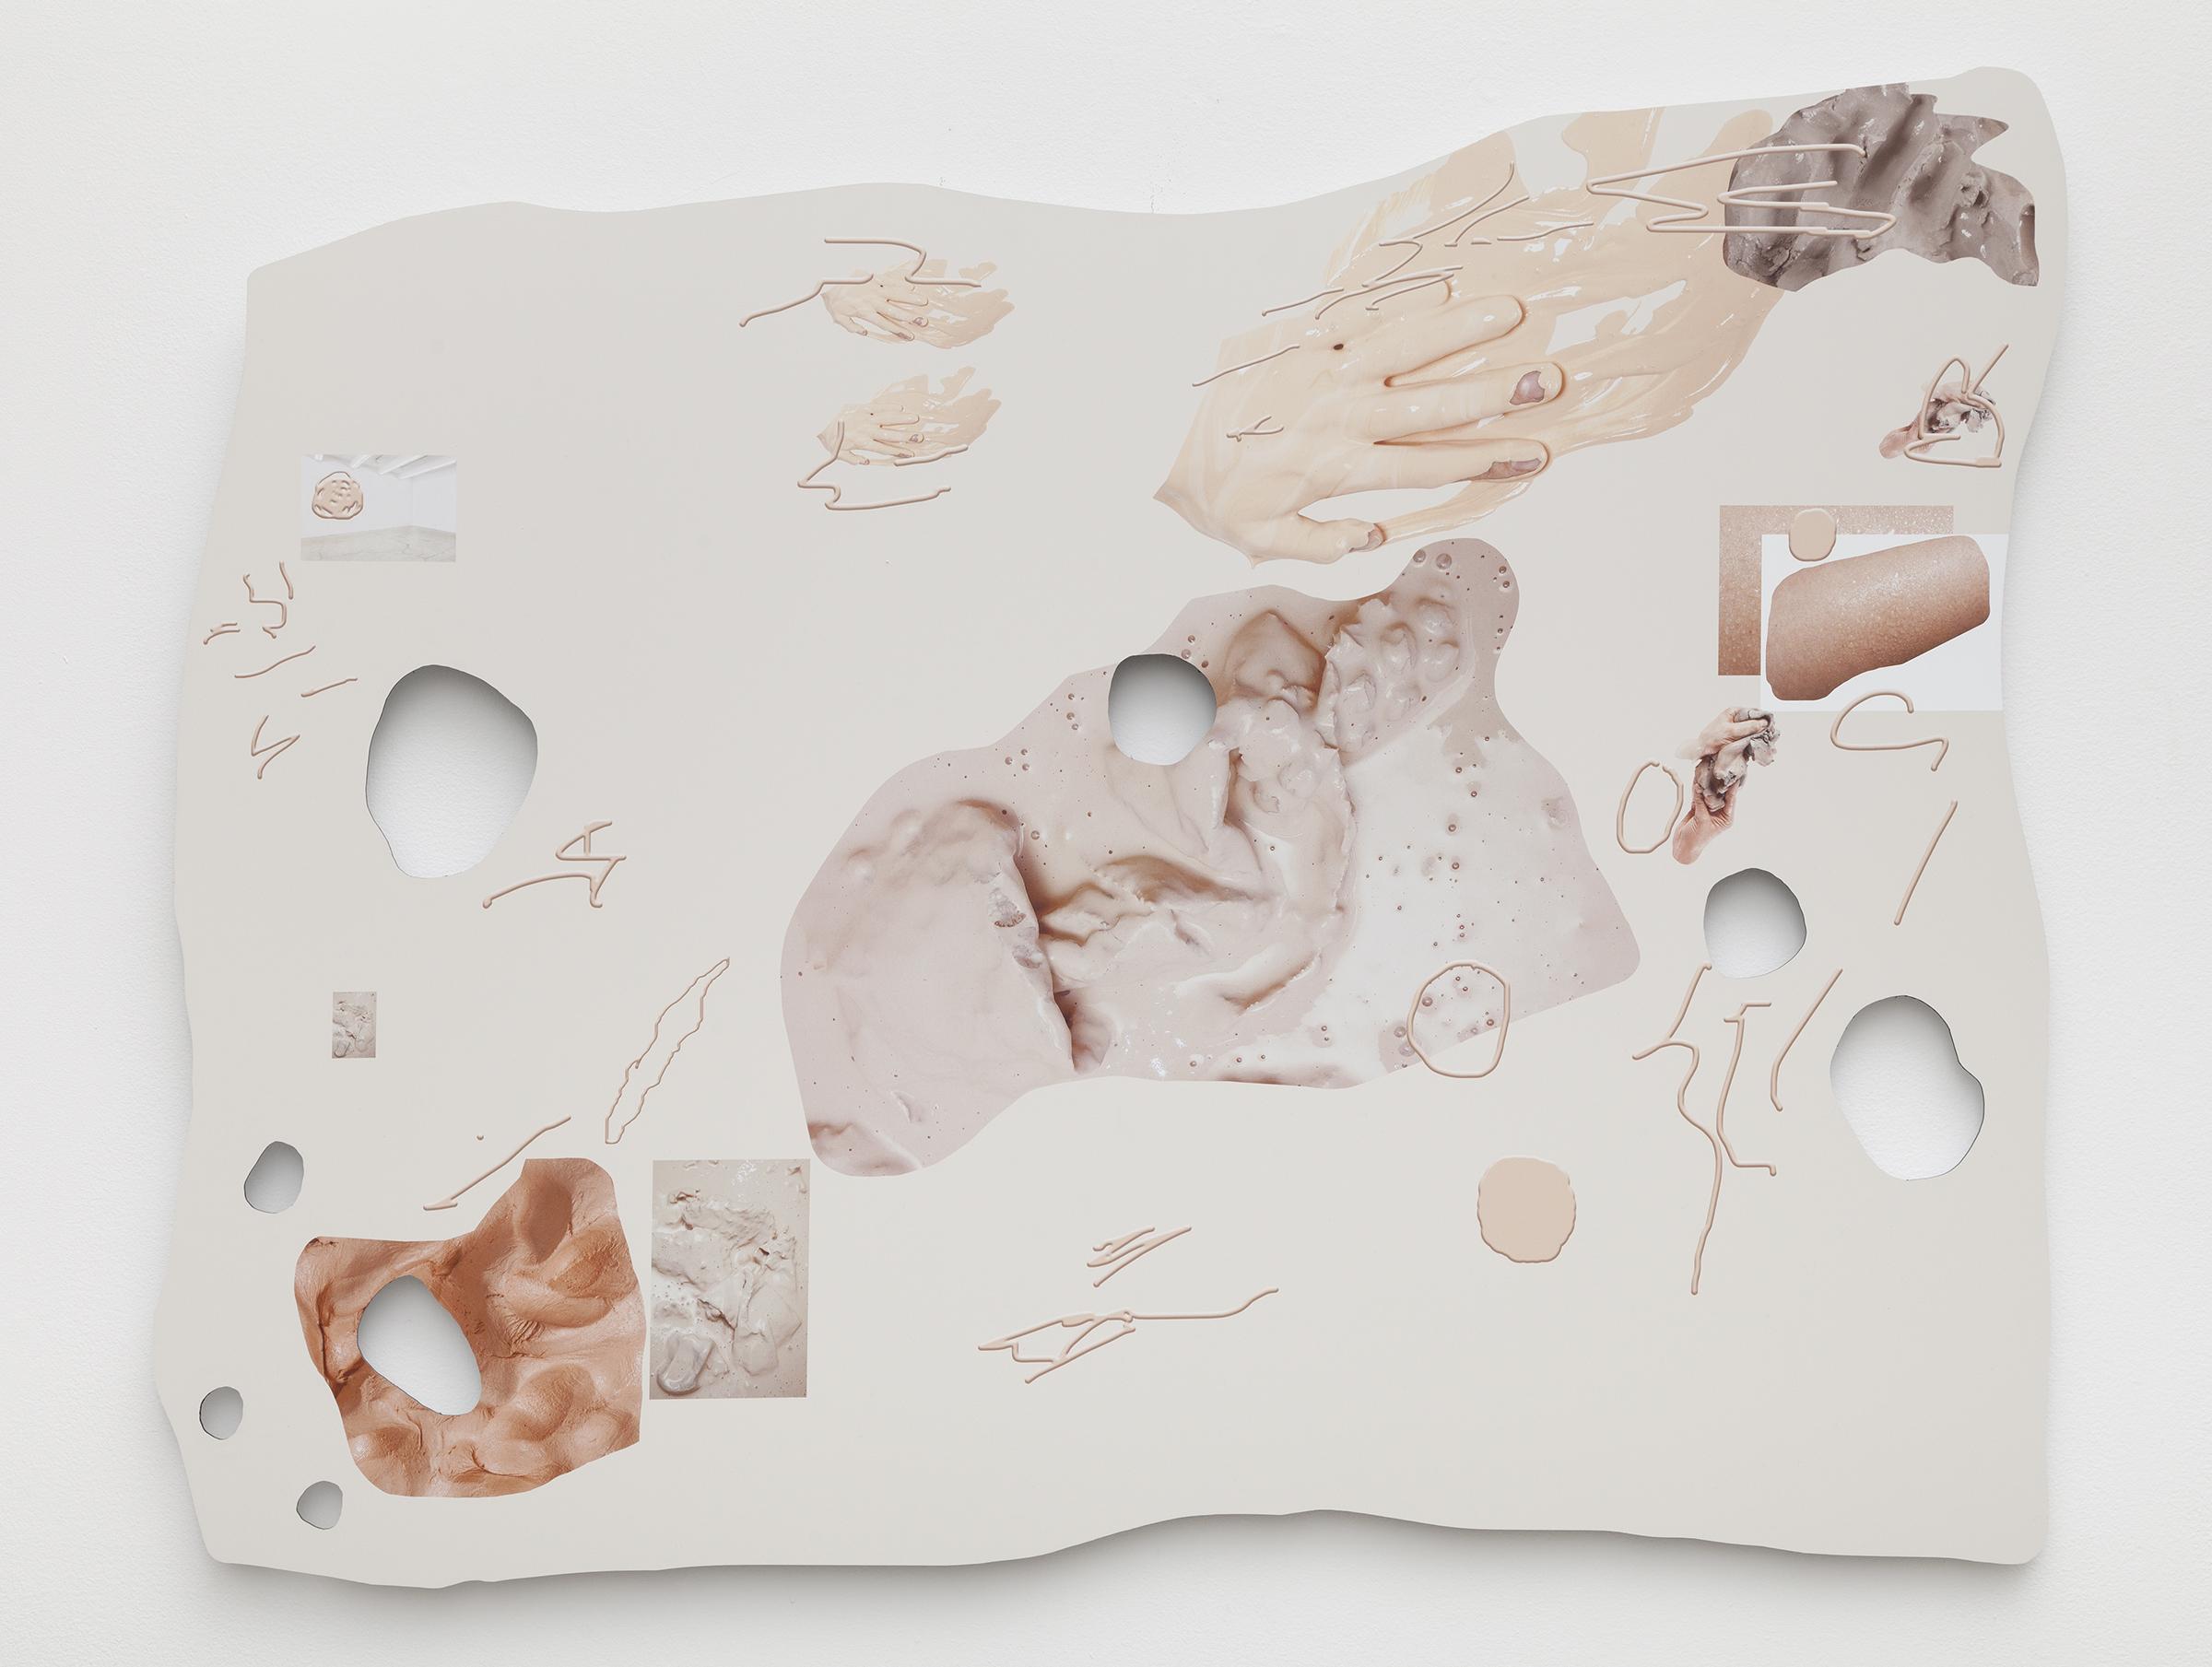 Rachel De Joode, Drawing or flowy conglomeration. Hey! VII , 2015,archival inkjet print on Dibond,31.5 x 39 in